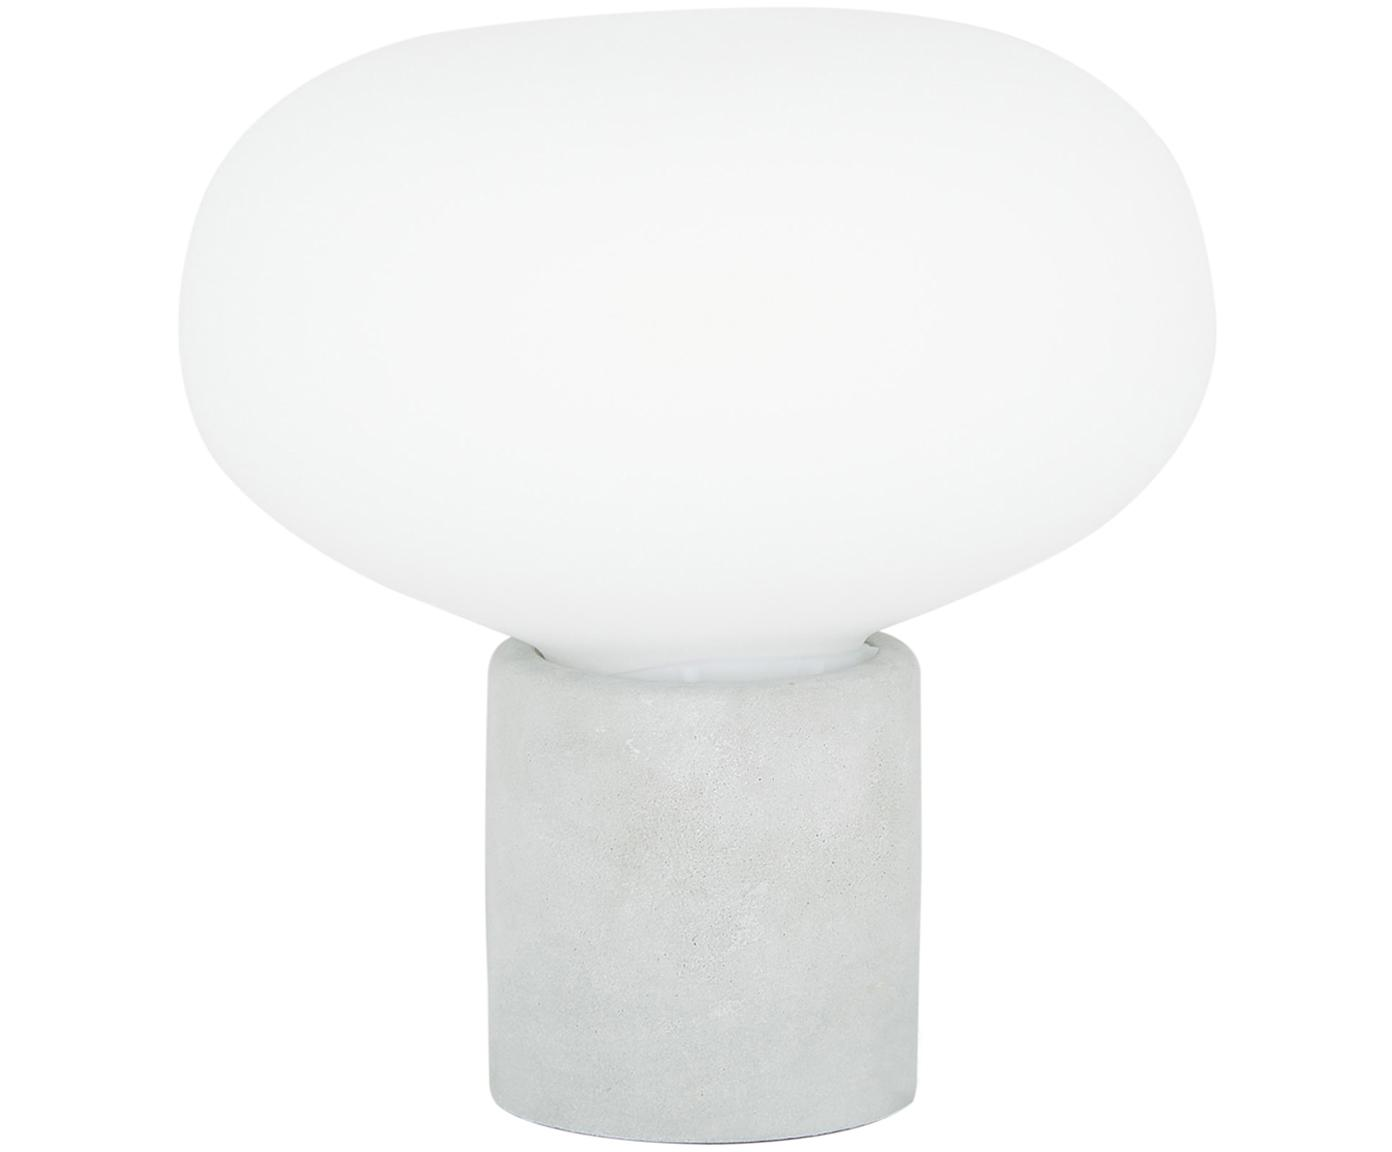 Betonnen tafellamp Alma, Lampvoet: beton, Lampenkap: glas, Lampvoet: grijs, betonkleurig. Lampenkap: wit, Ø 23 x H 24 cm